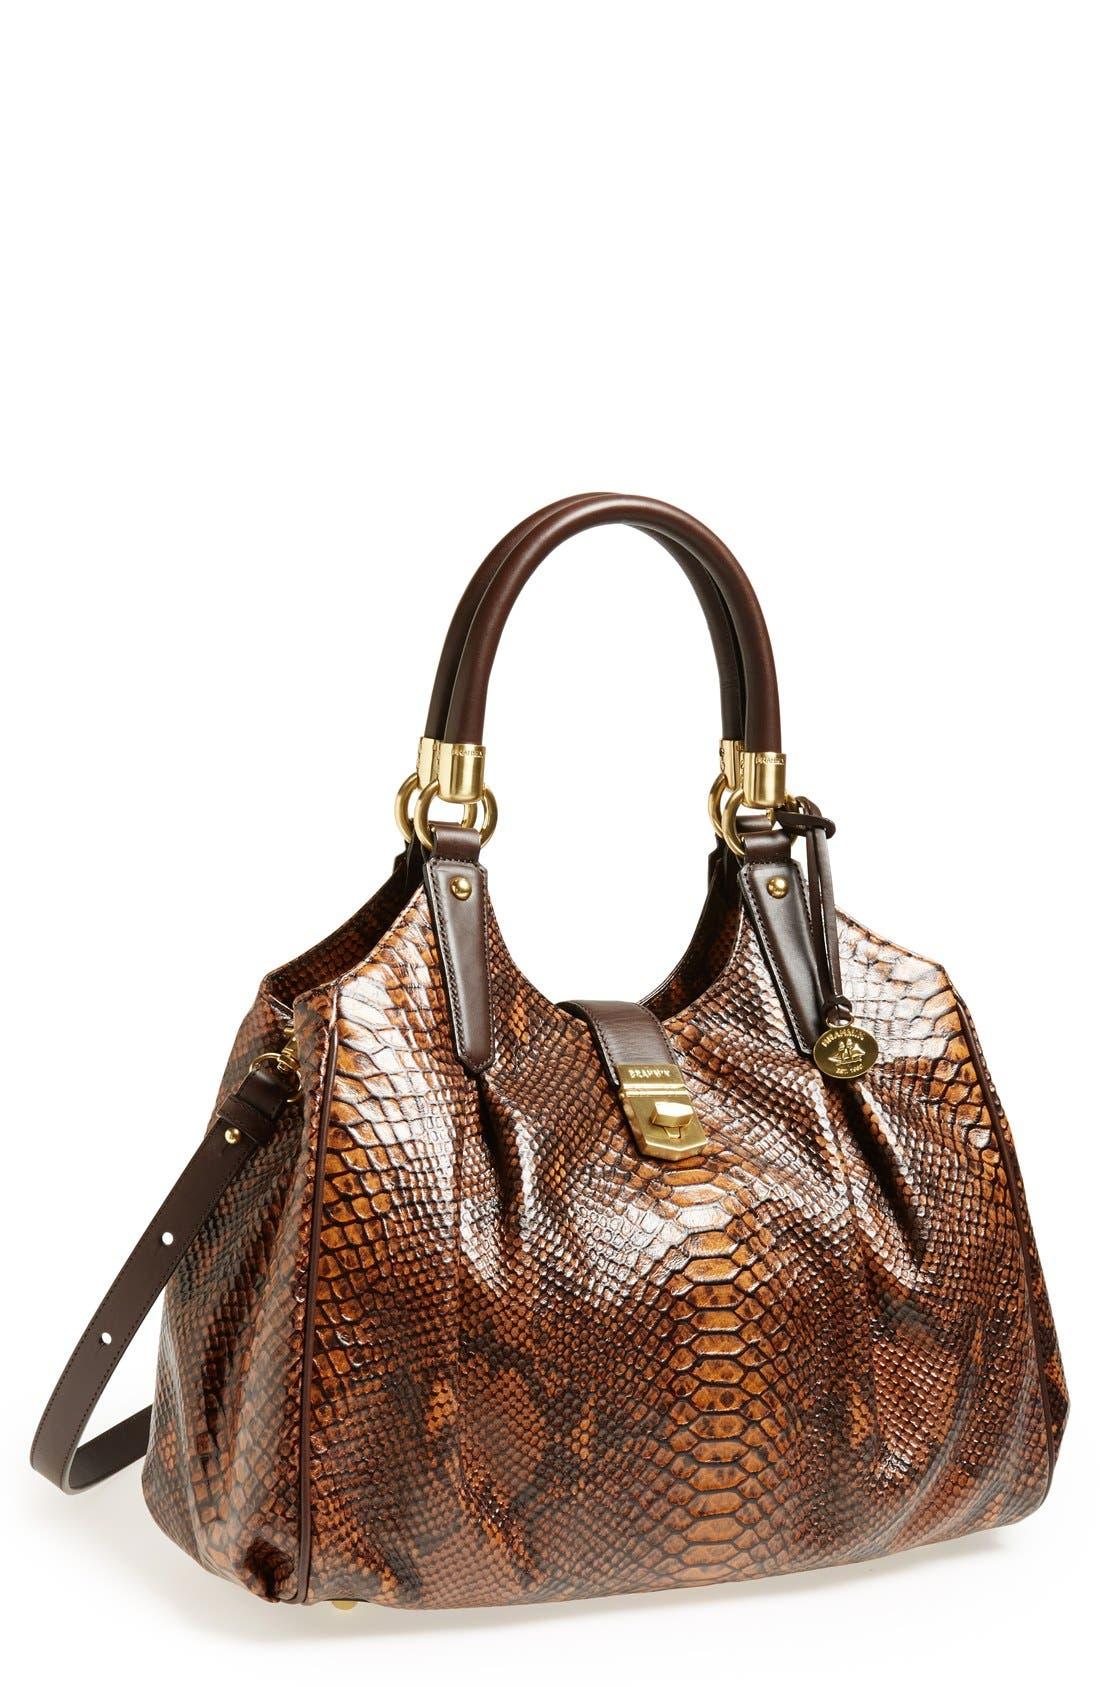 Main Image - Brahmin 'Elisa' Leather Shopper